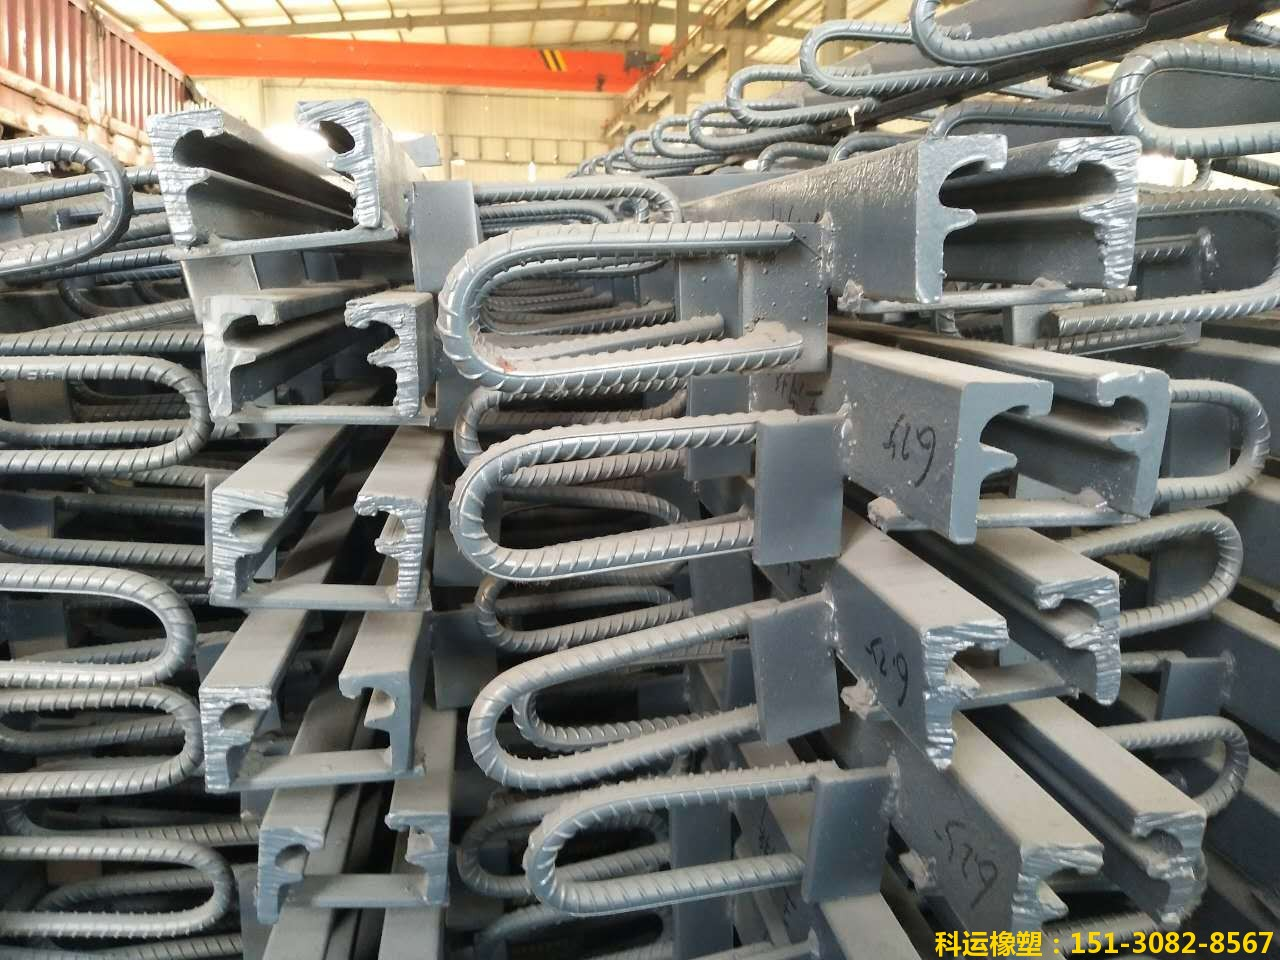 GQF-F80型桥梁伸缩缝装置安装养护步骤1